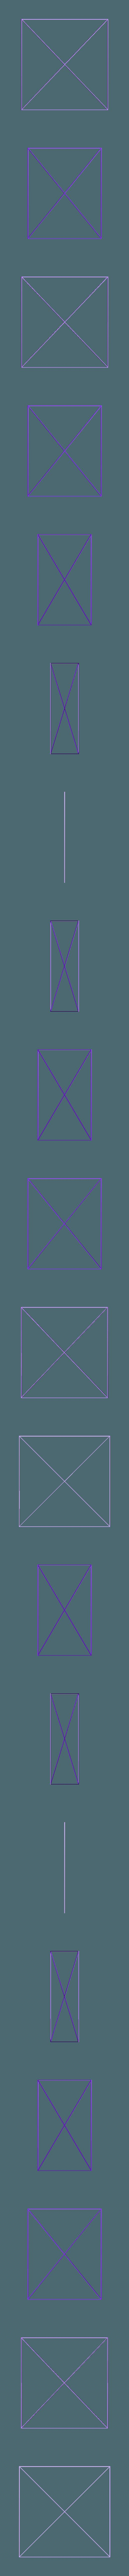 200mmTestPattern.stl Download free STL file 200mm Simple Test Pattern / Calibration • 3D printing design, KerseyFabrications